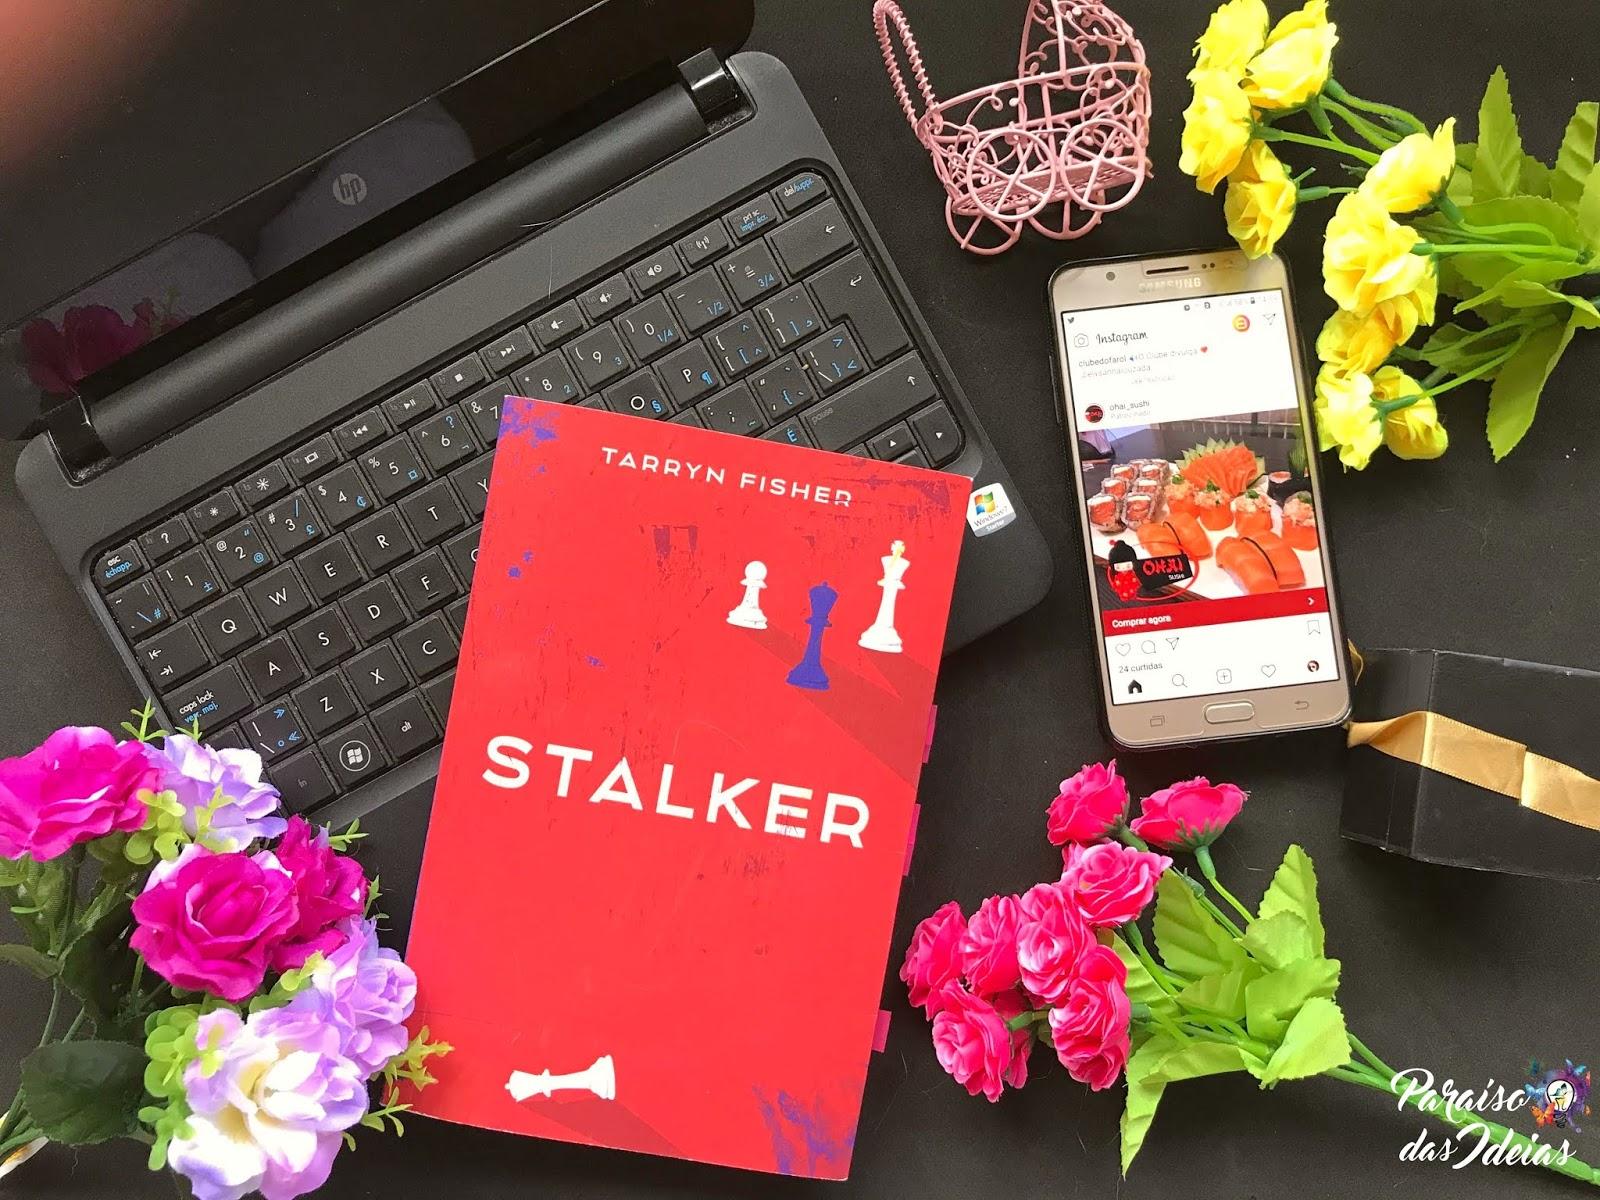 [Resenha] Stalker - Tarryn Fisher